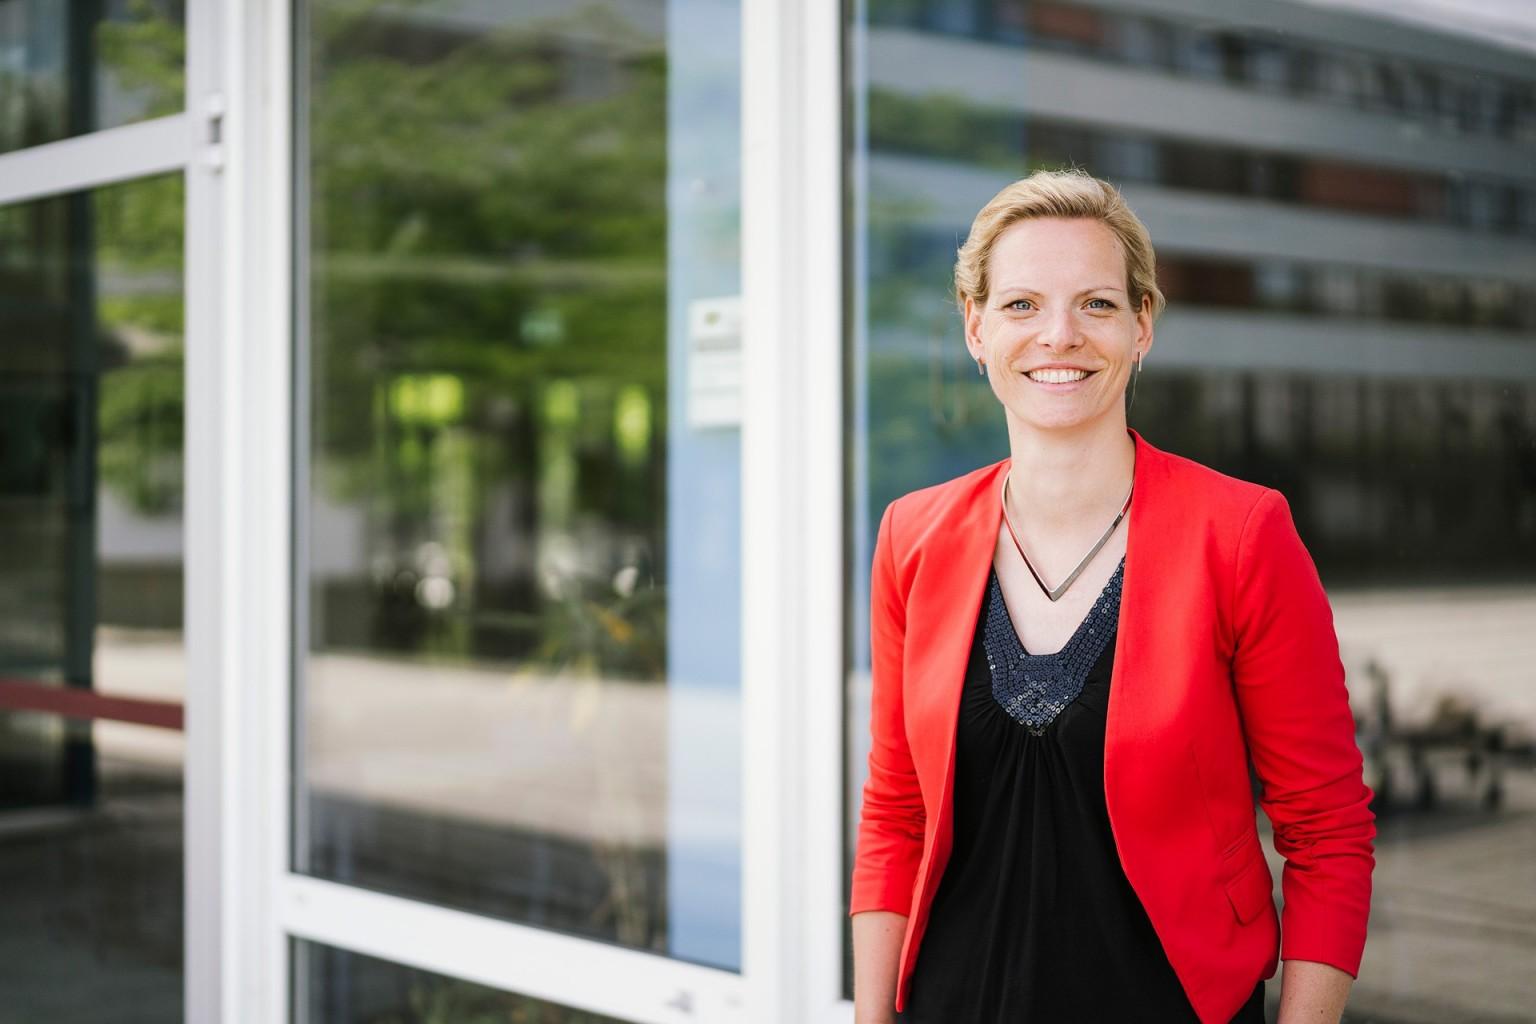 Dr. Anika Noack